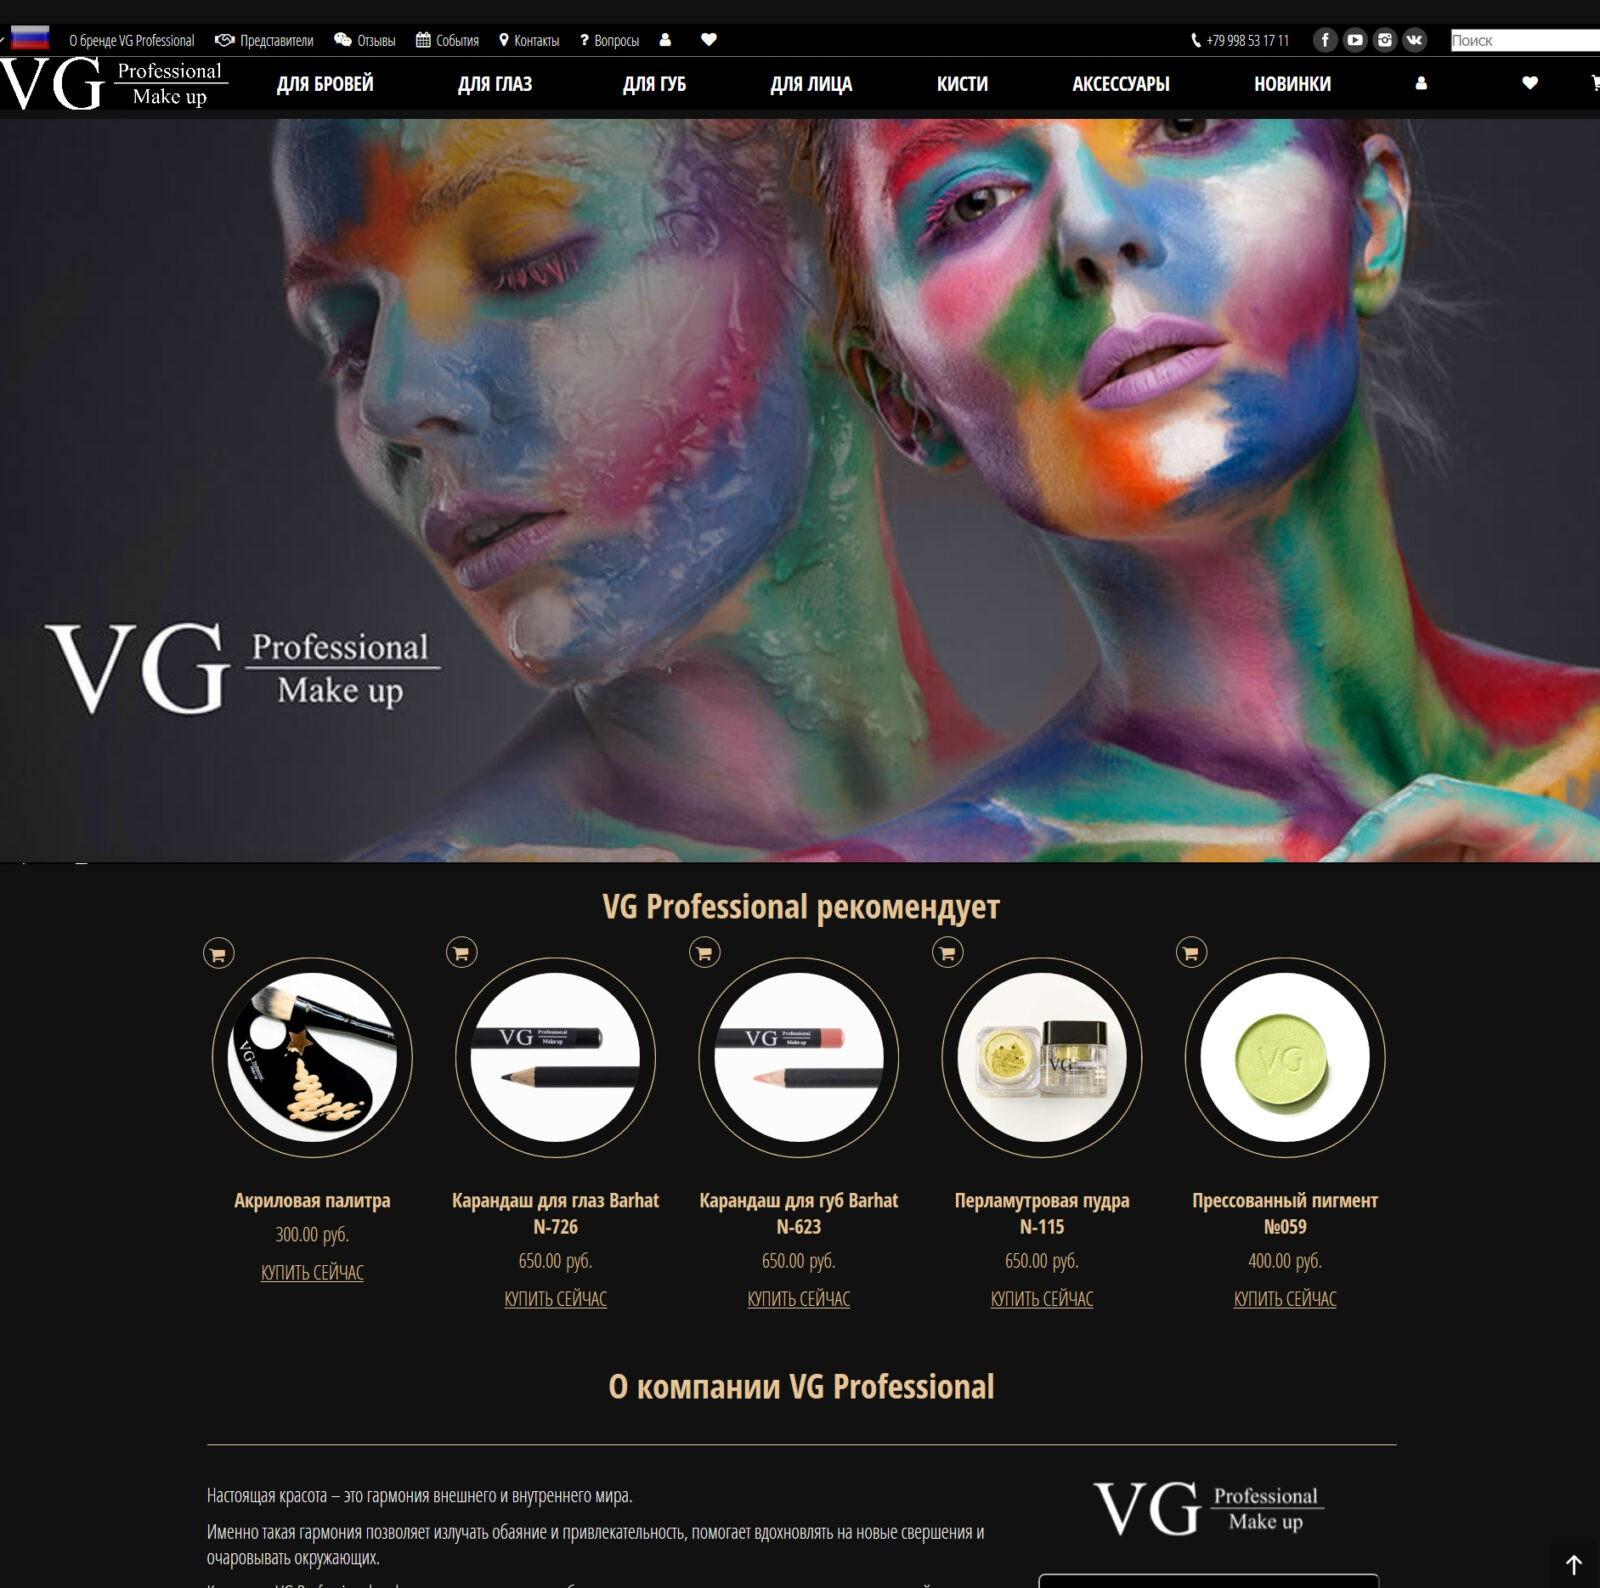 Доработка интернет-магазина VG professional